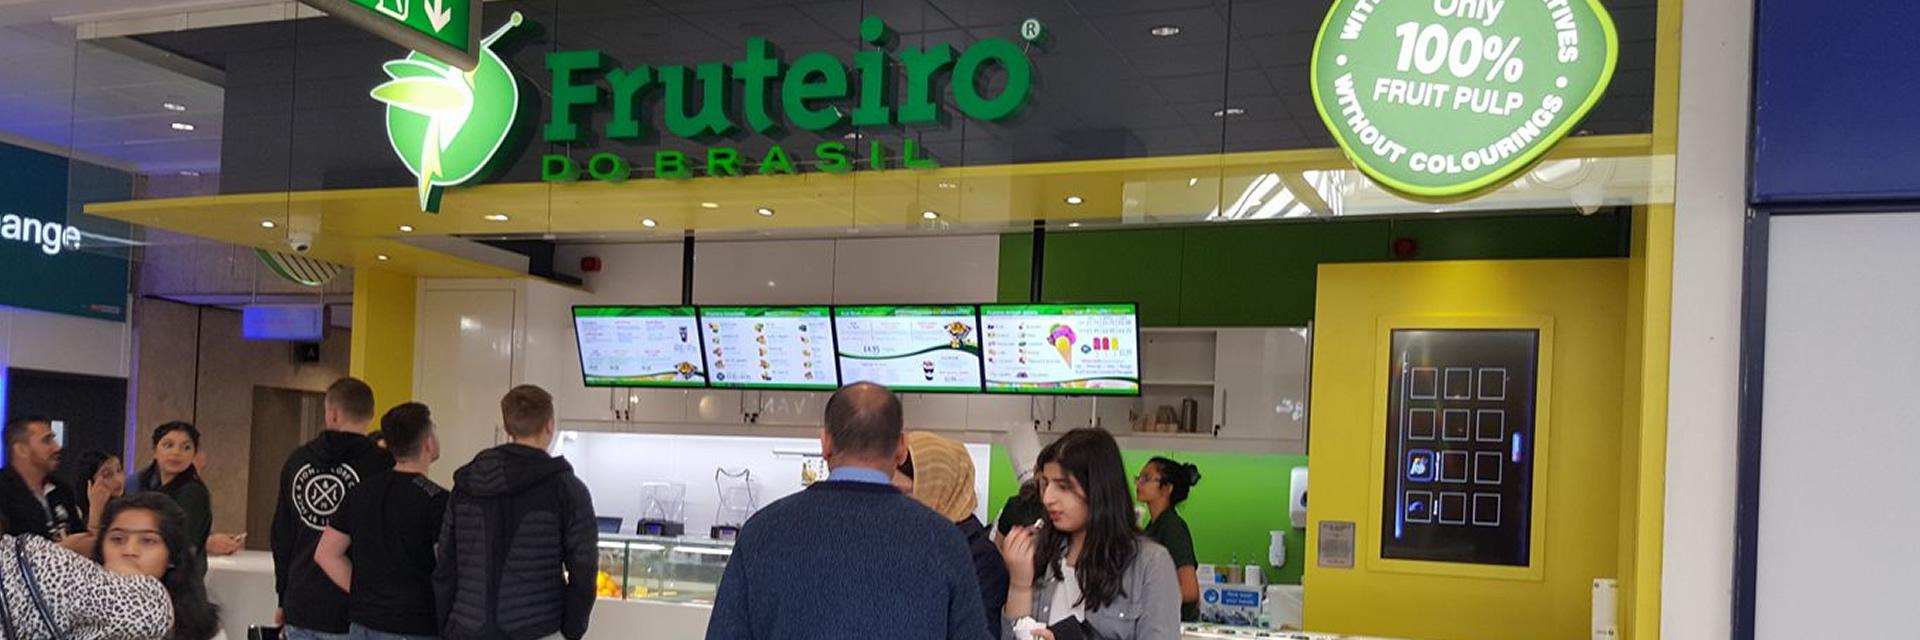 Digital Menu Board installation at Fruteiro in Manchester